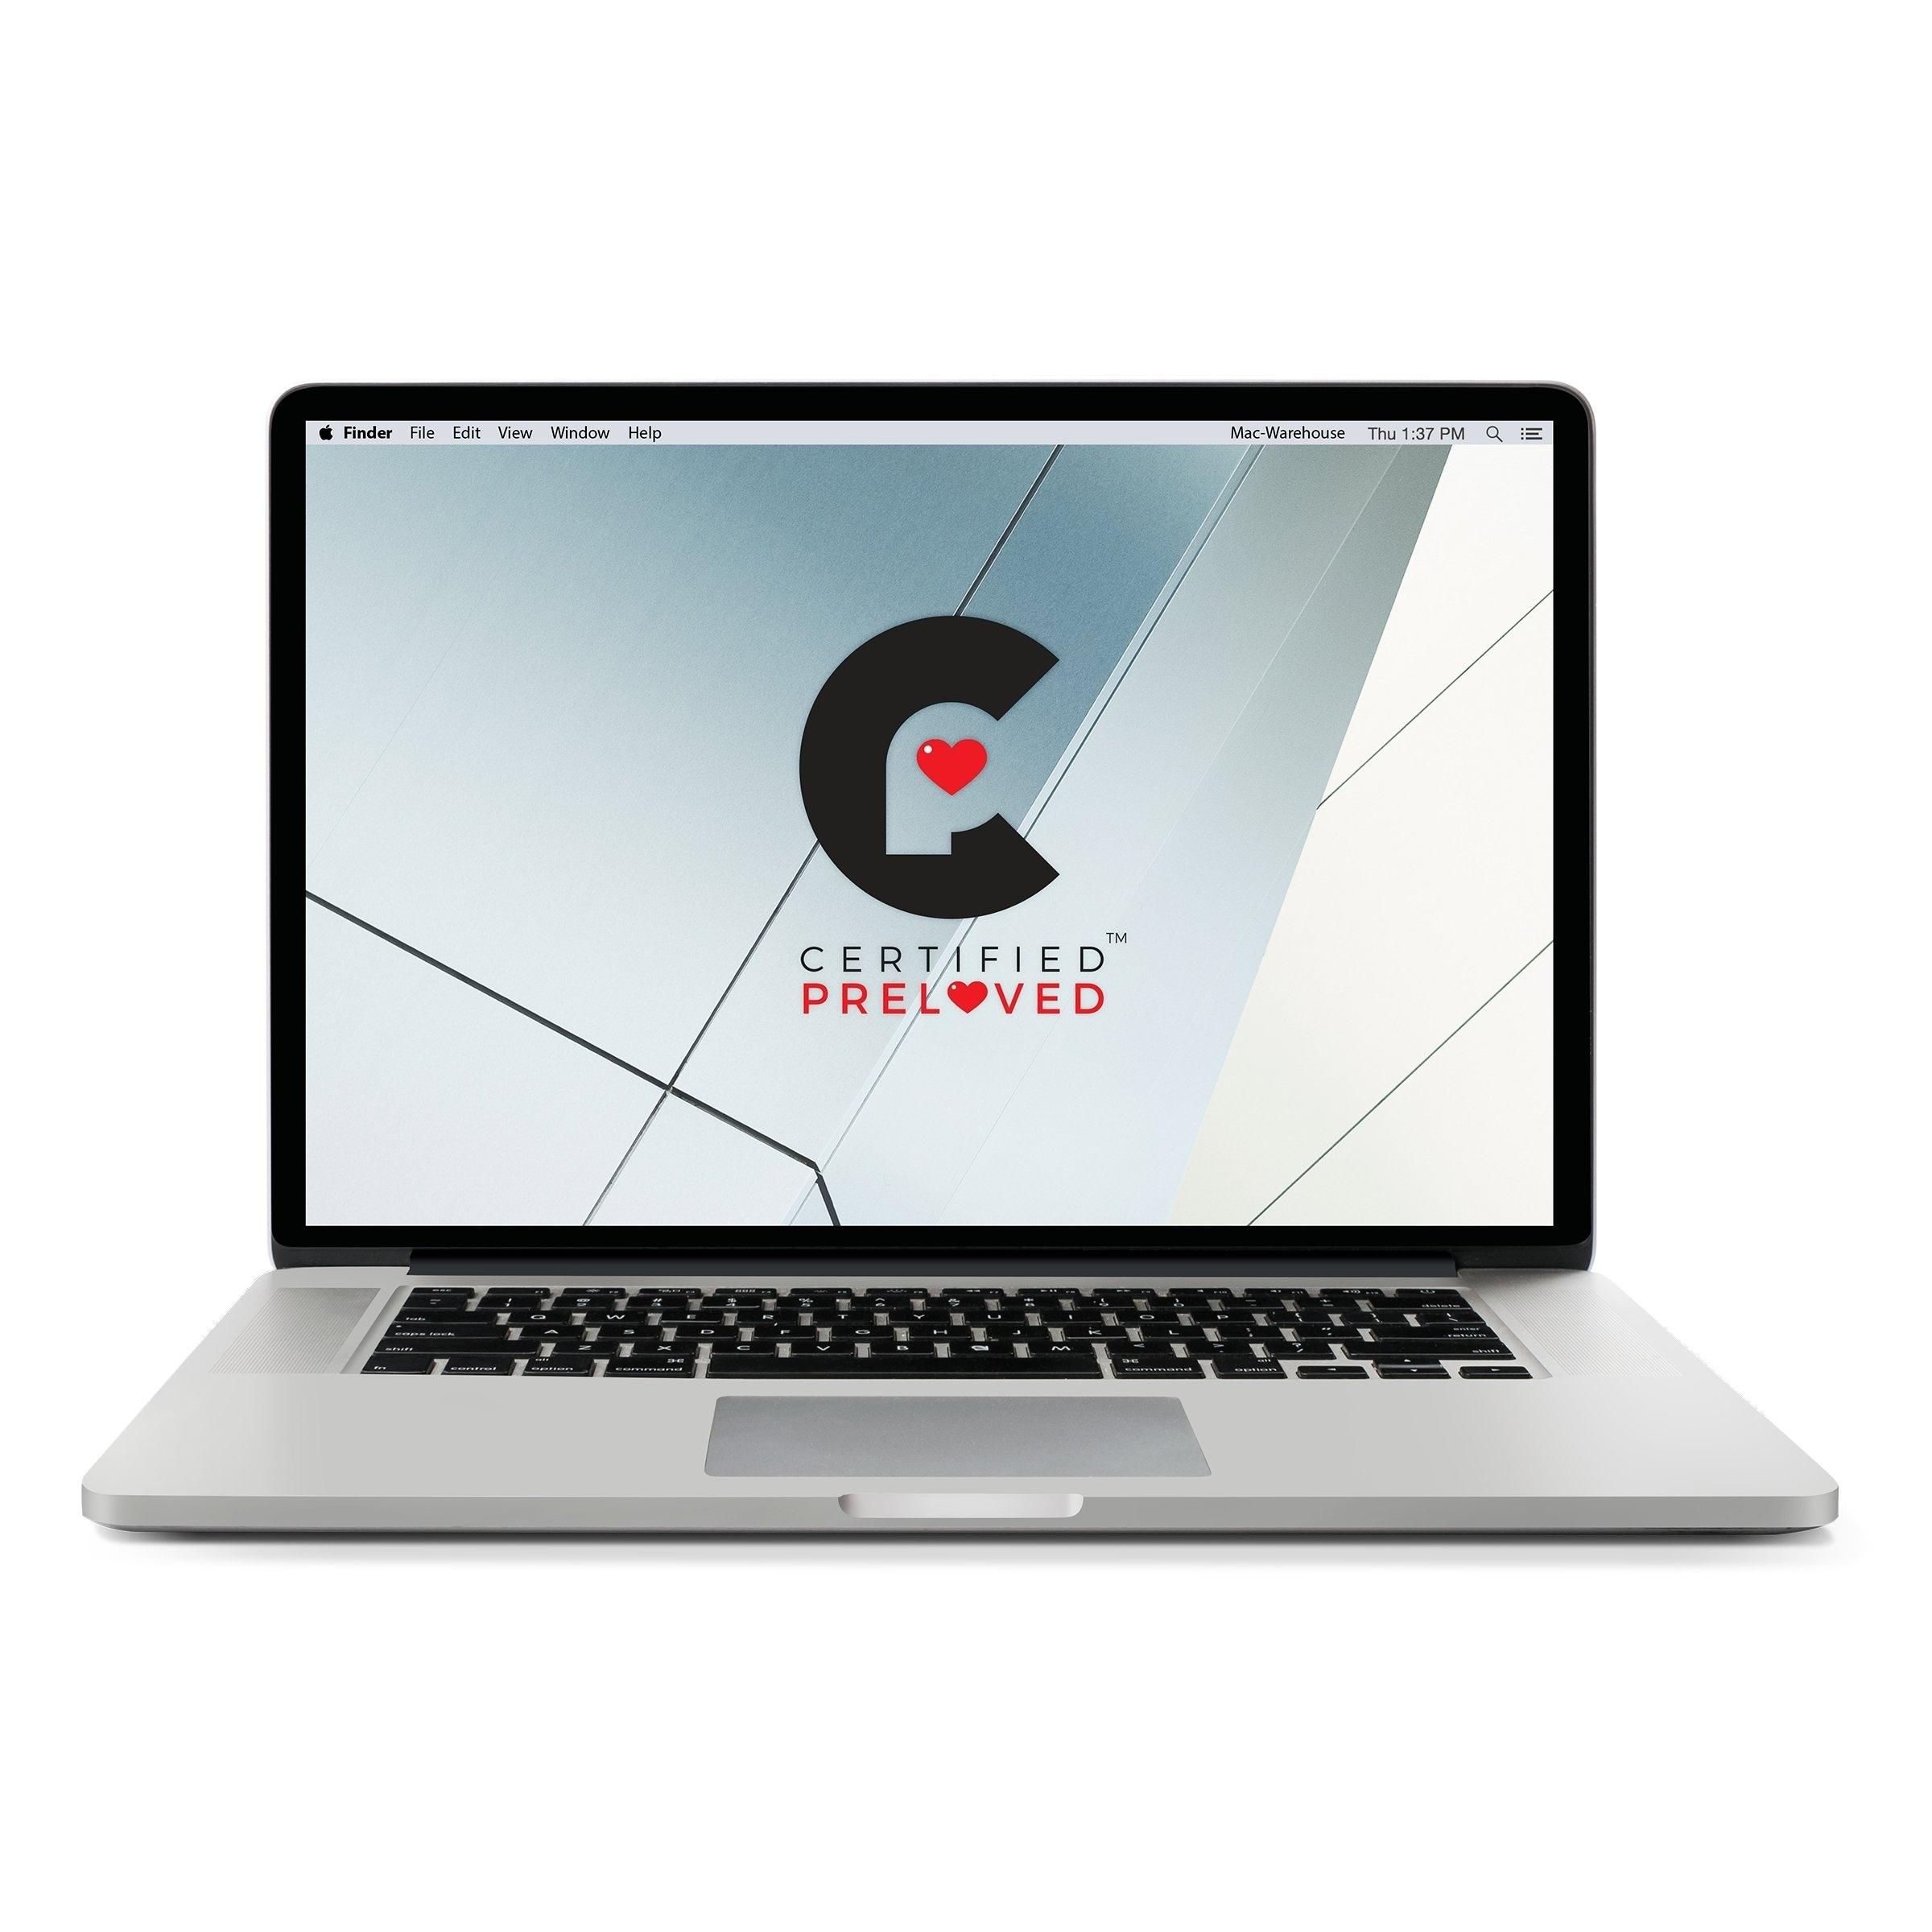 Apple ME874LL/A 15.4 inch Macbook Pro Retina QCi7 2.6 GHz - Refurbished by Overstock 256GB Flash - 16 GB